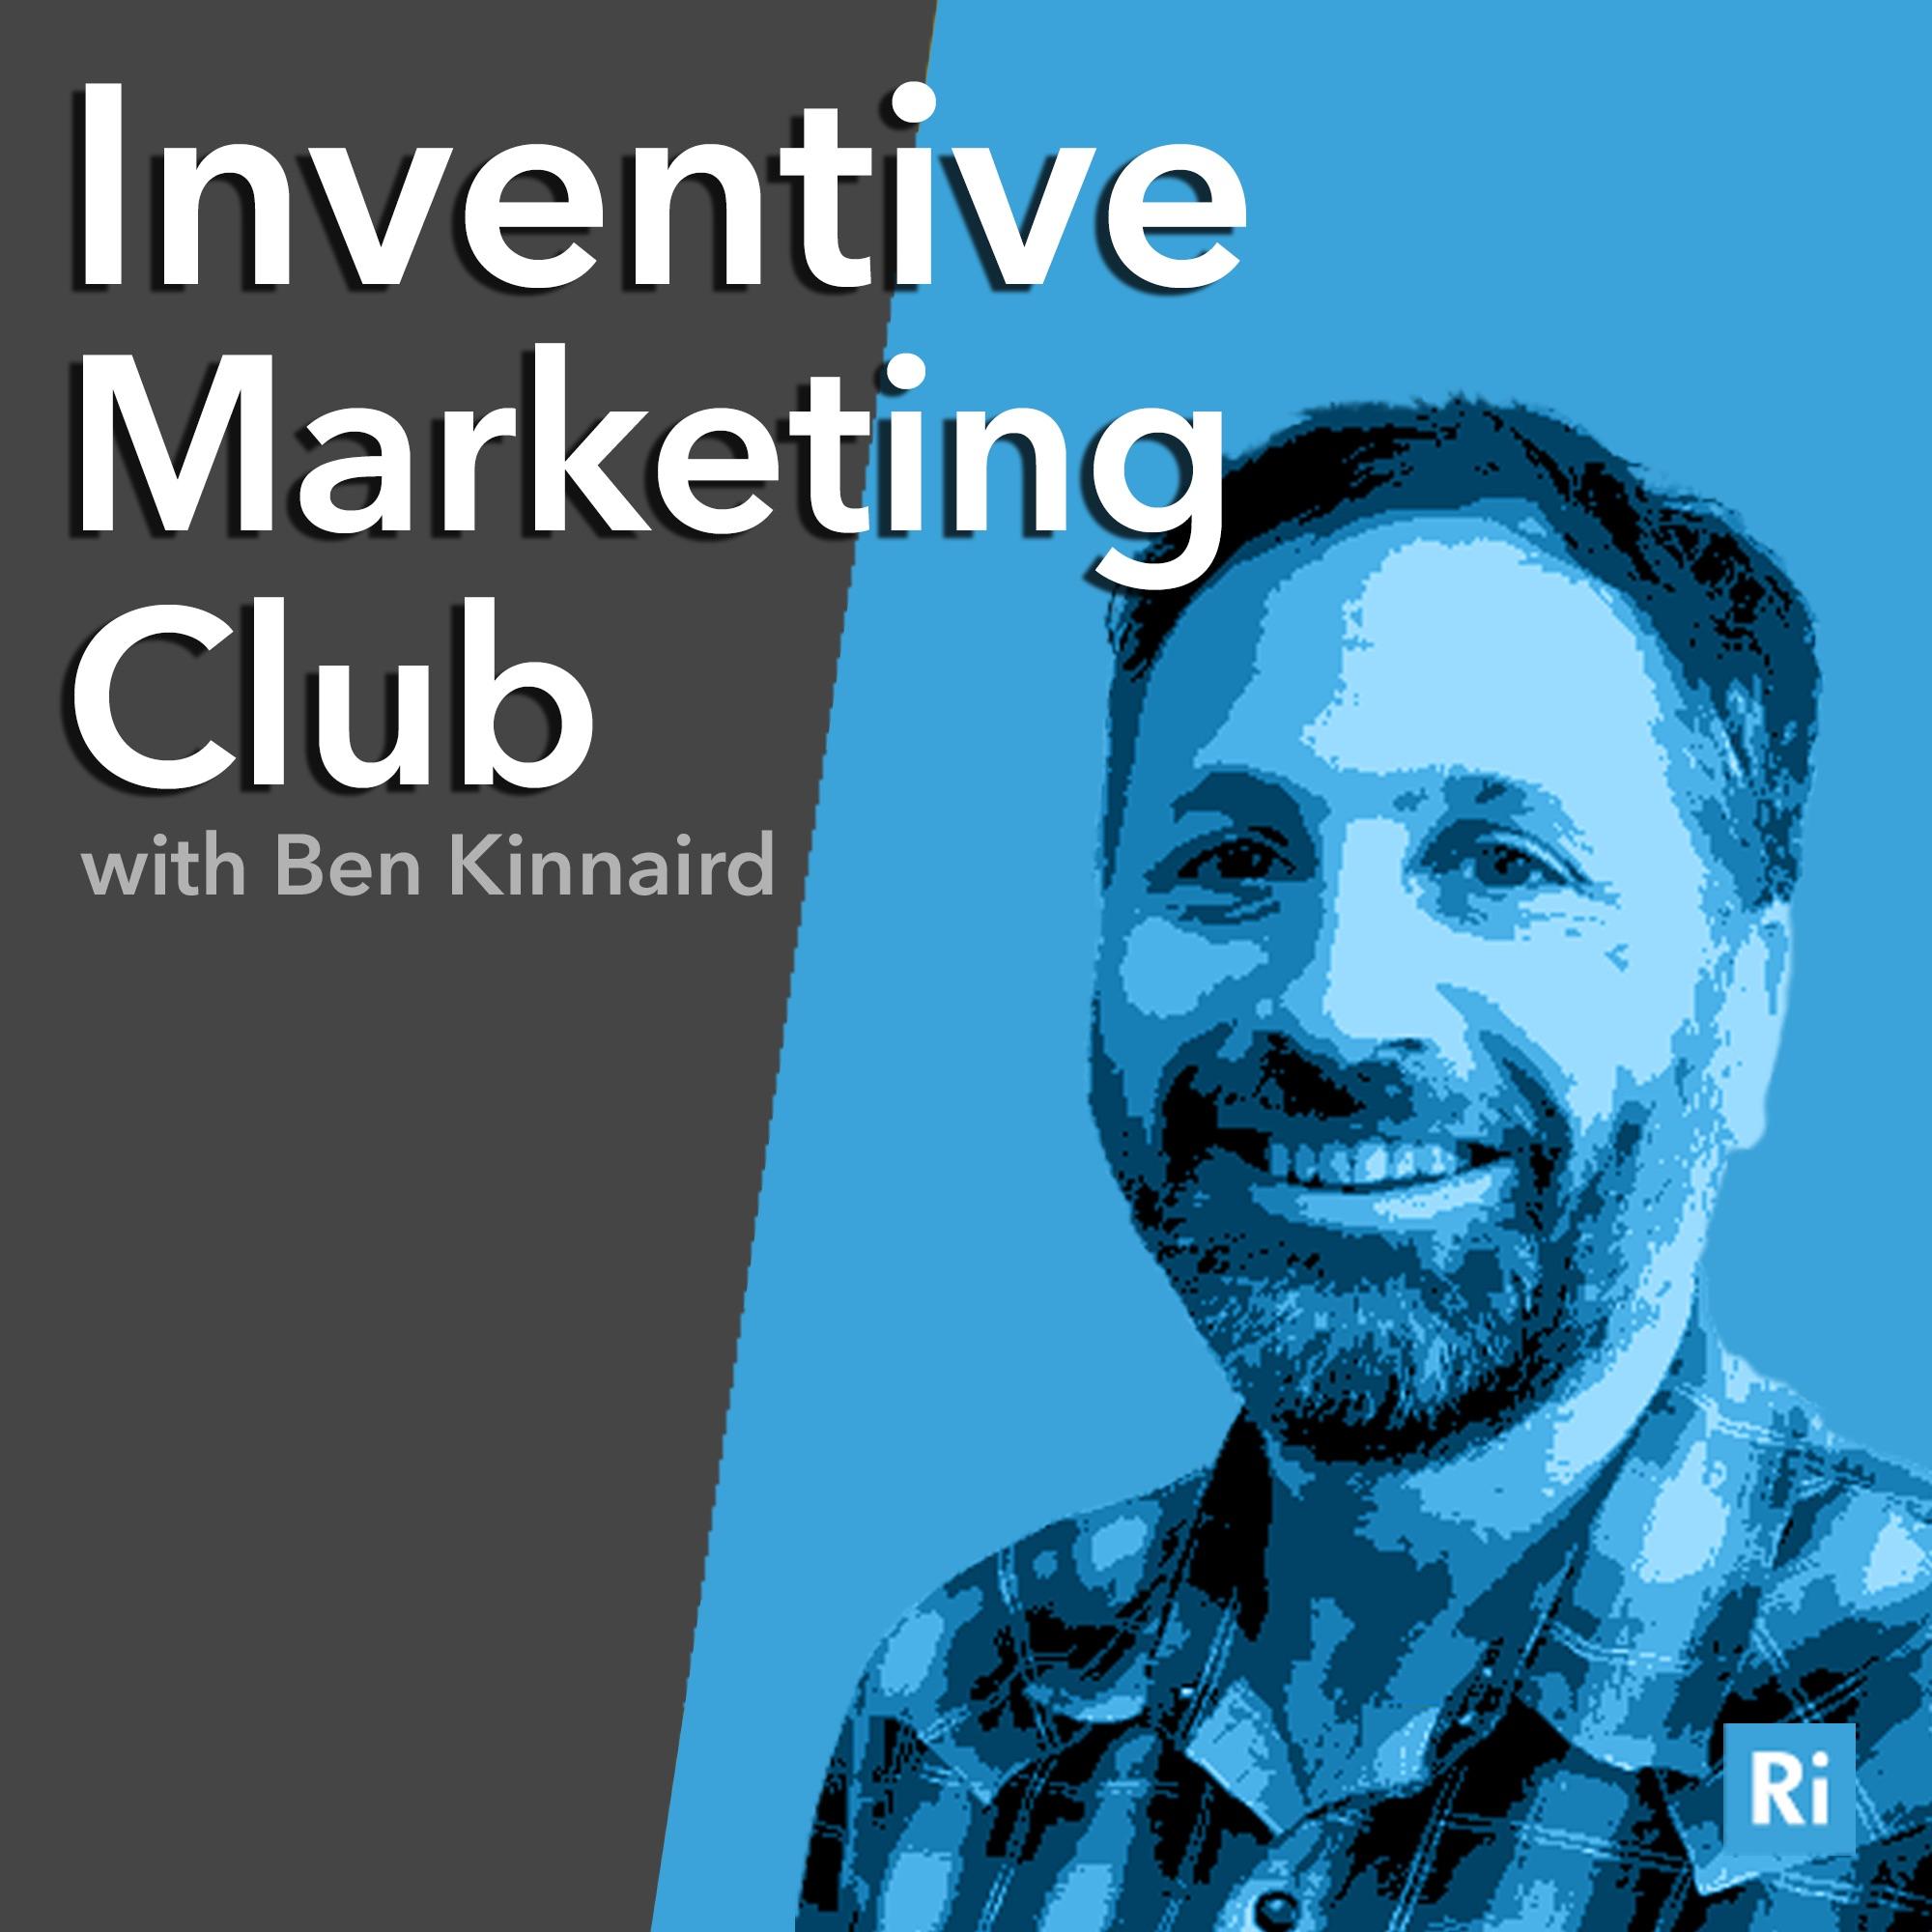 Inventive Marketing Club  - A Marketing Podcast